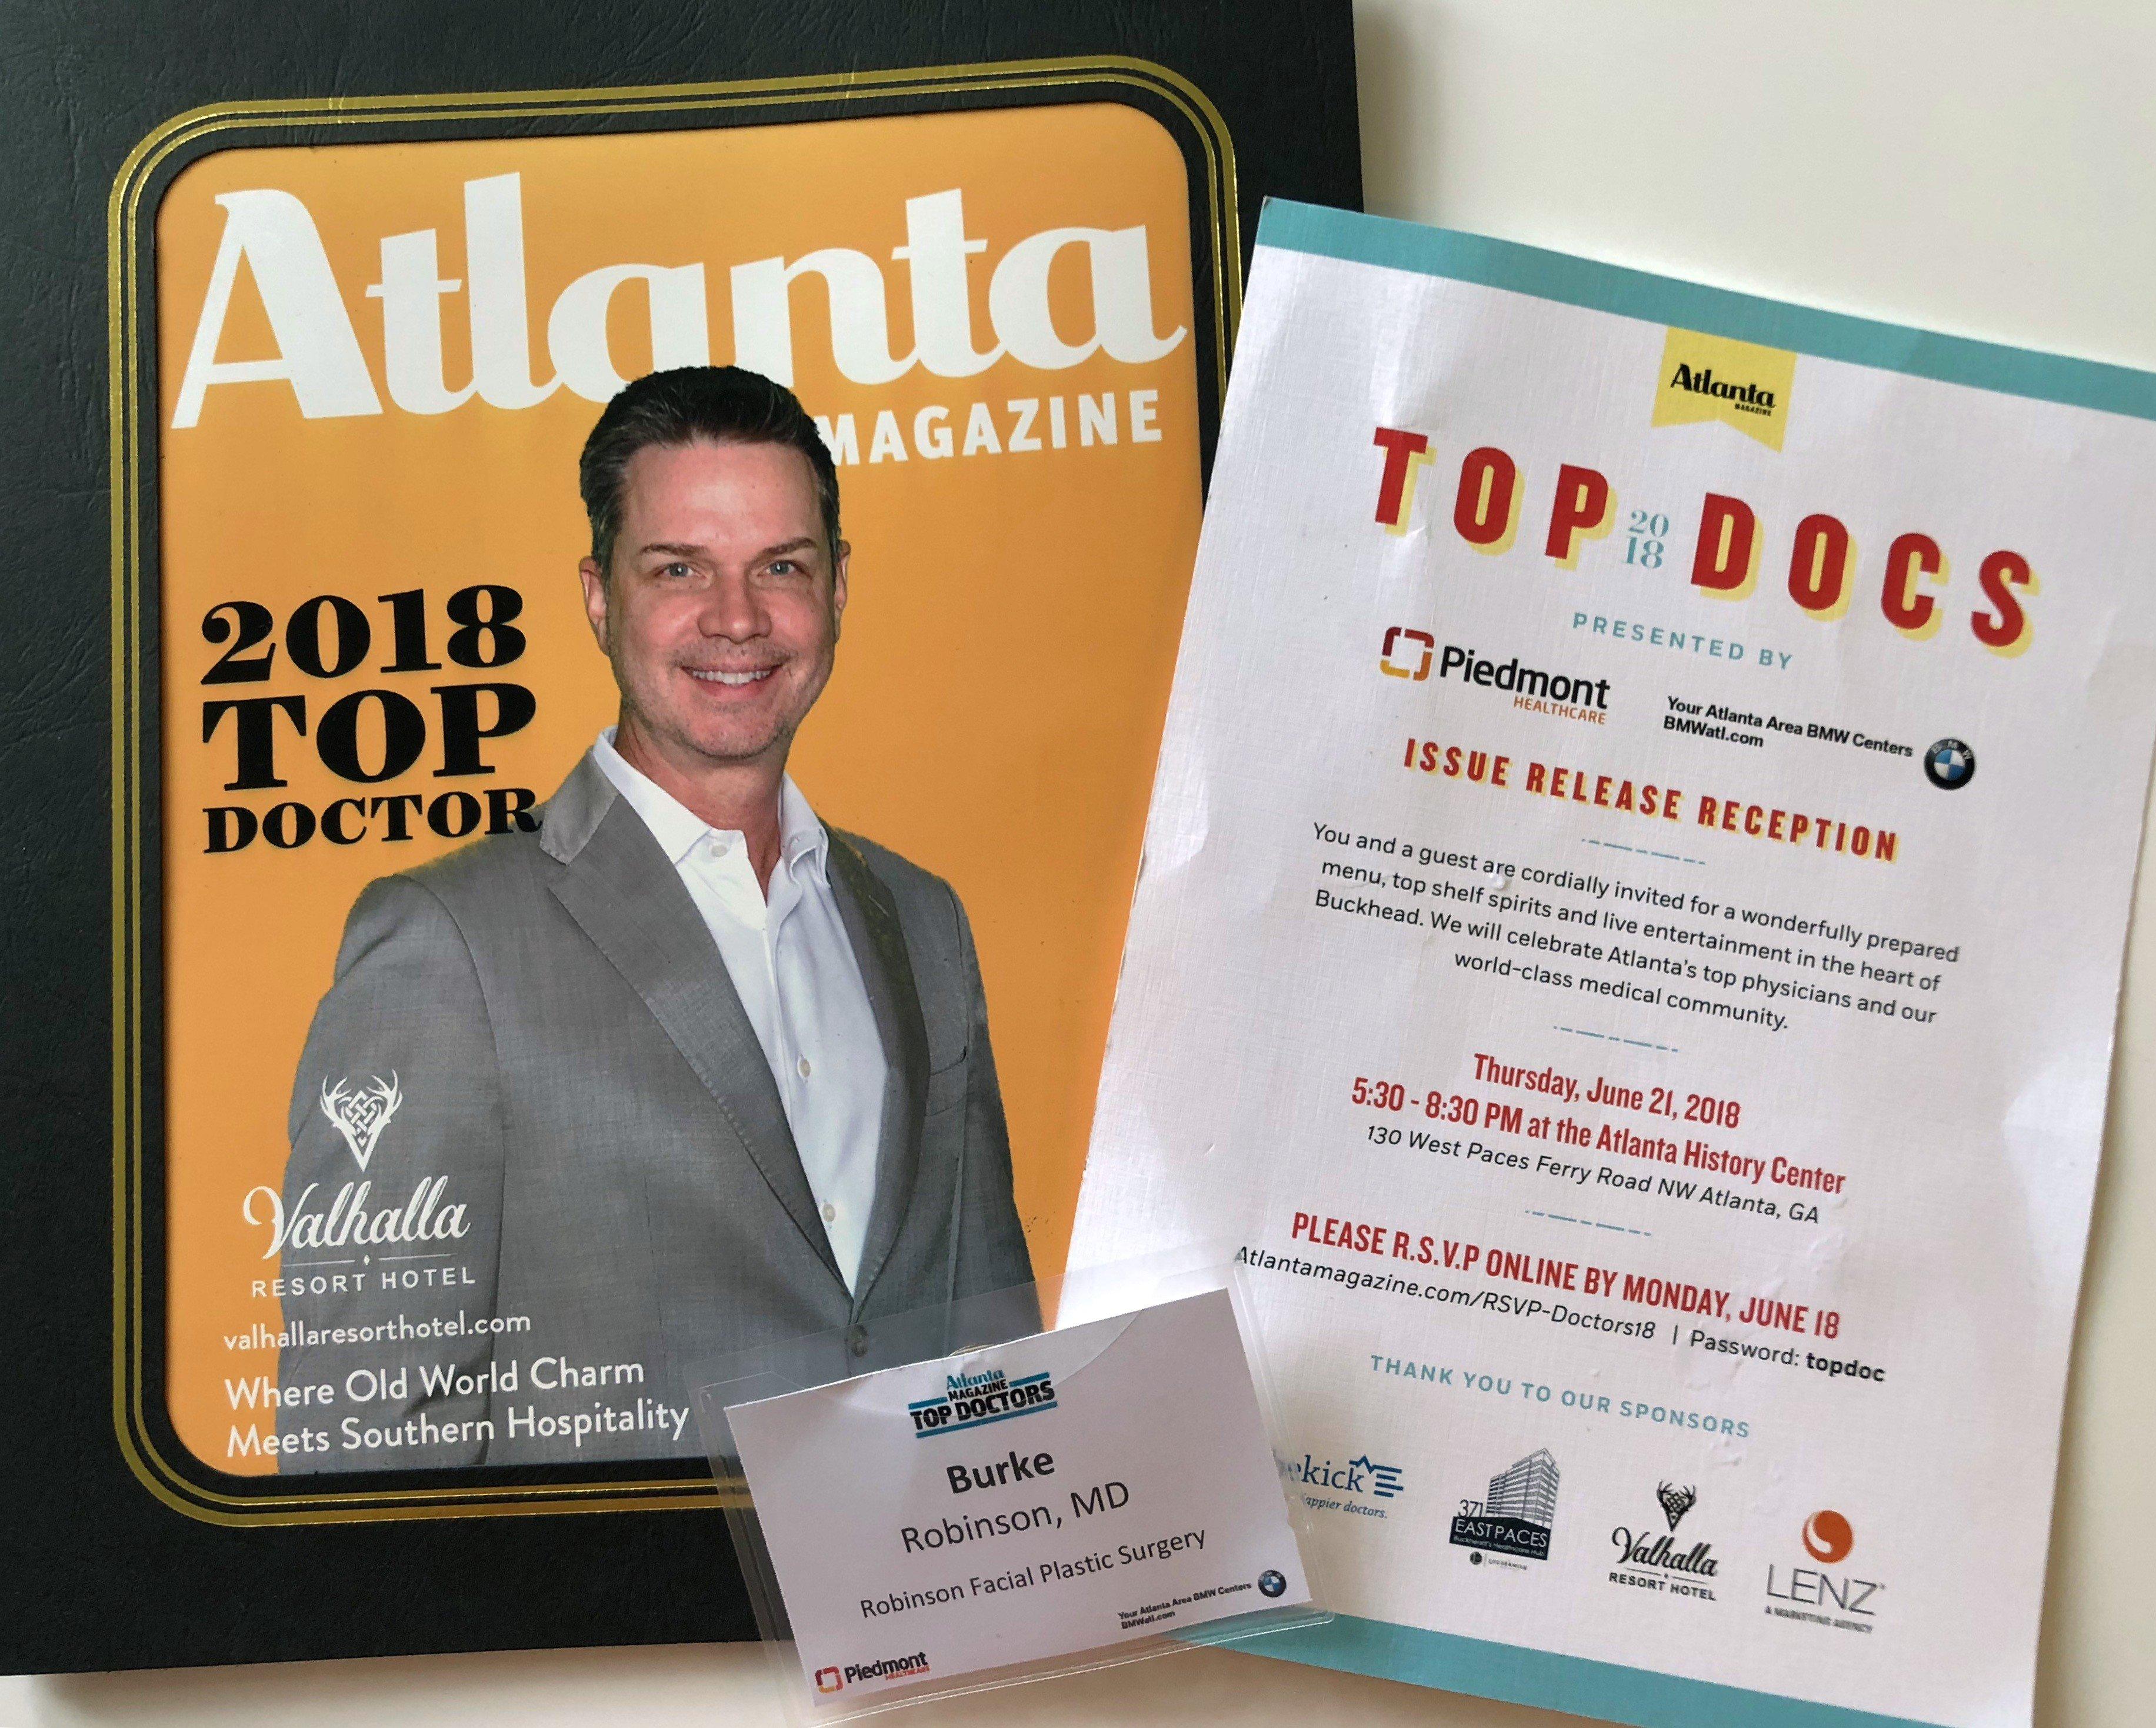 Atlanta Magazine Top Doctor 2018